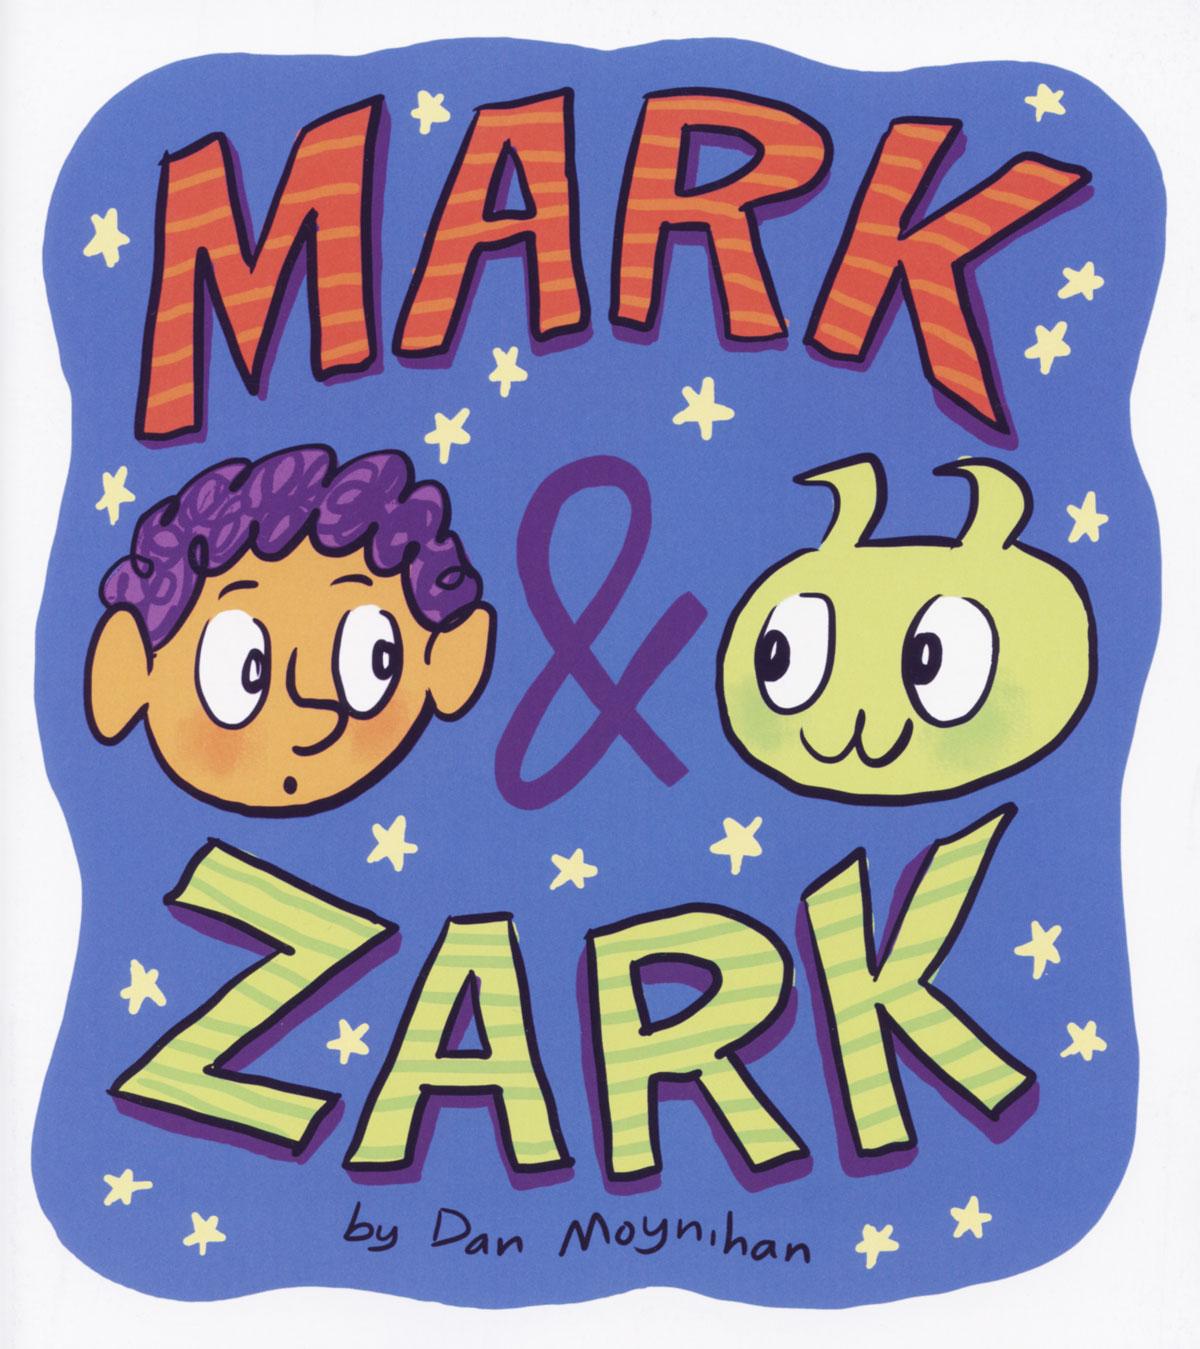 Mark & Zark No. 1 by Dan Moynihan